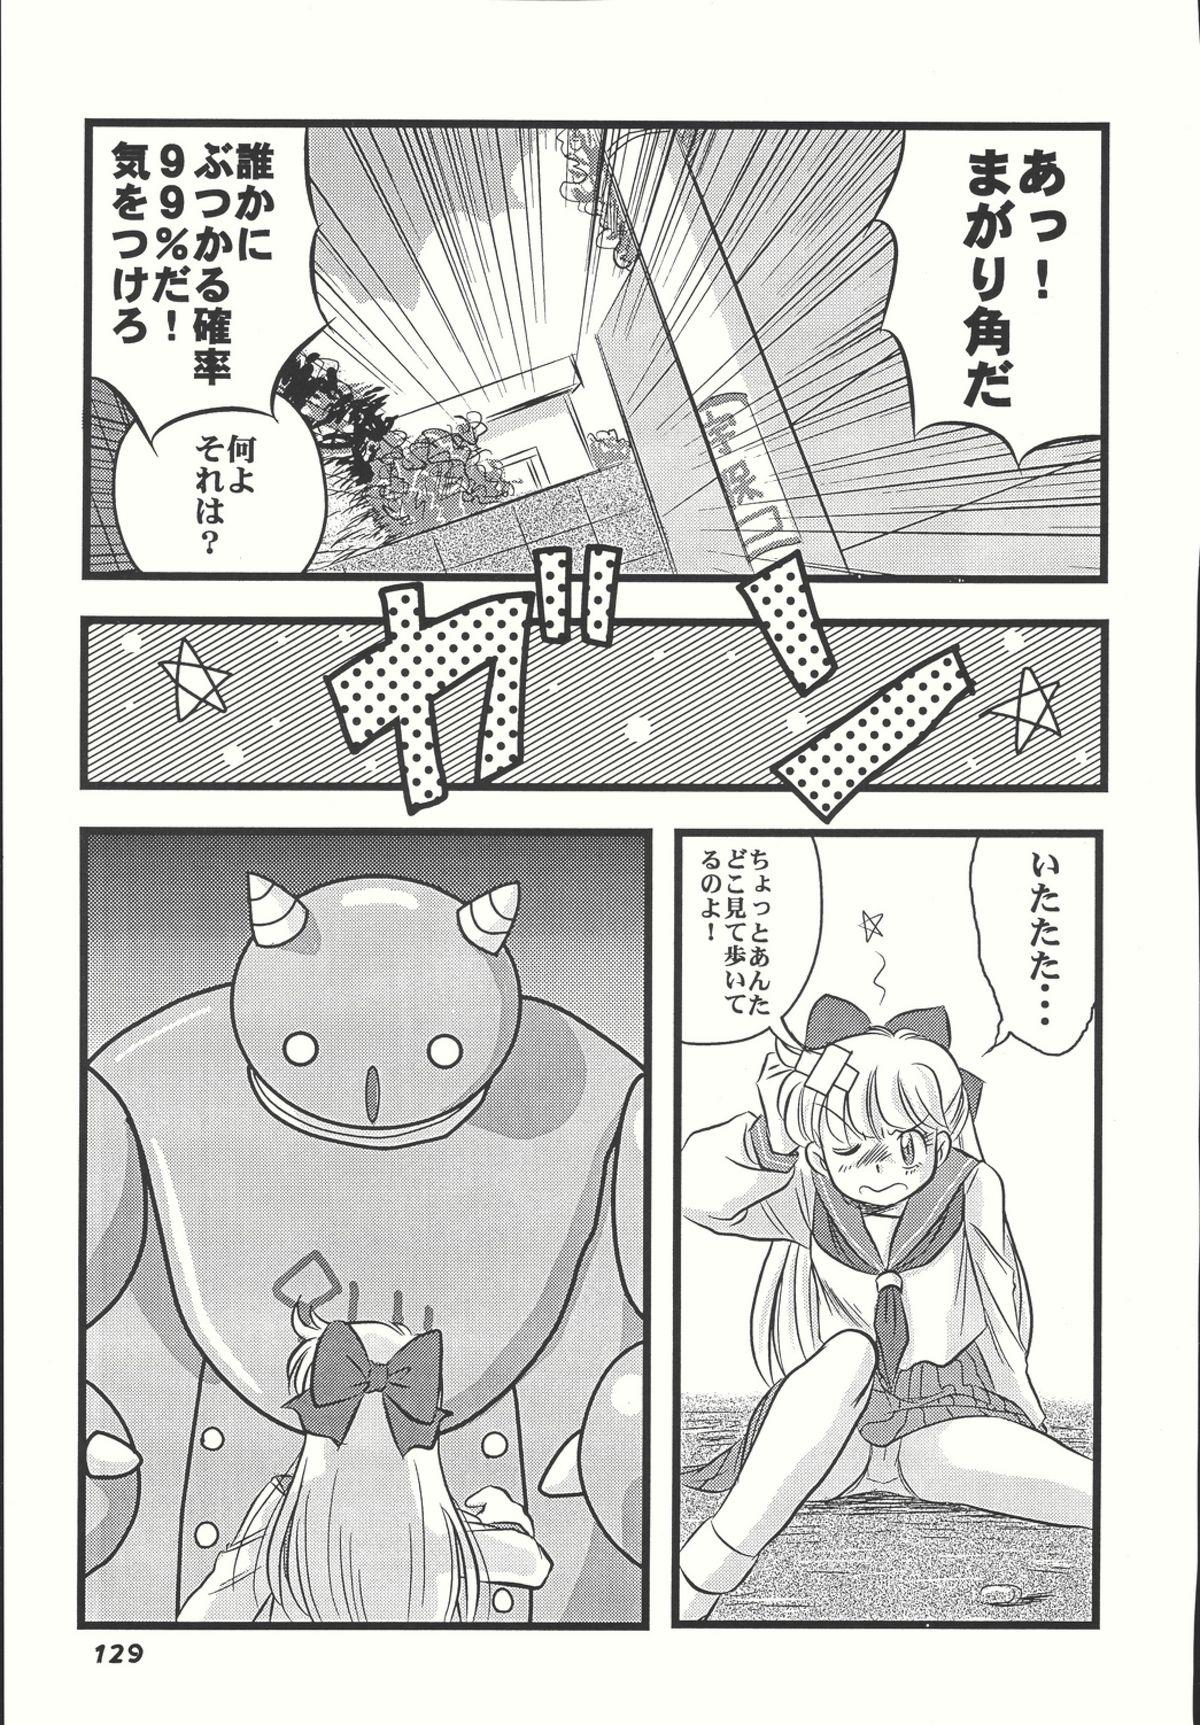 Sailor Spirits Super 127